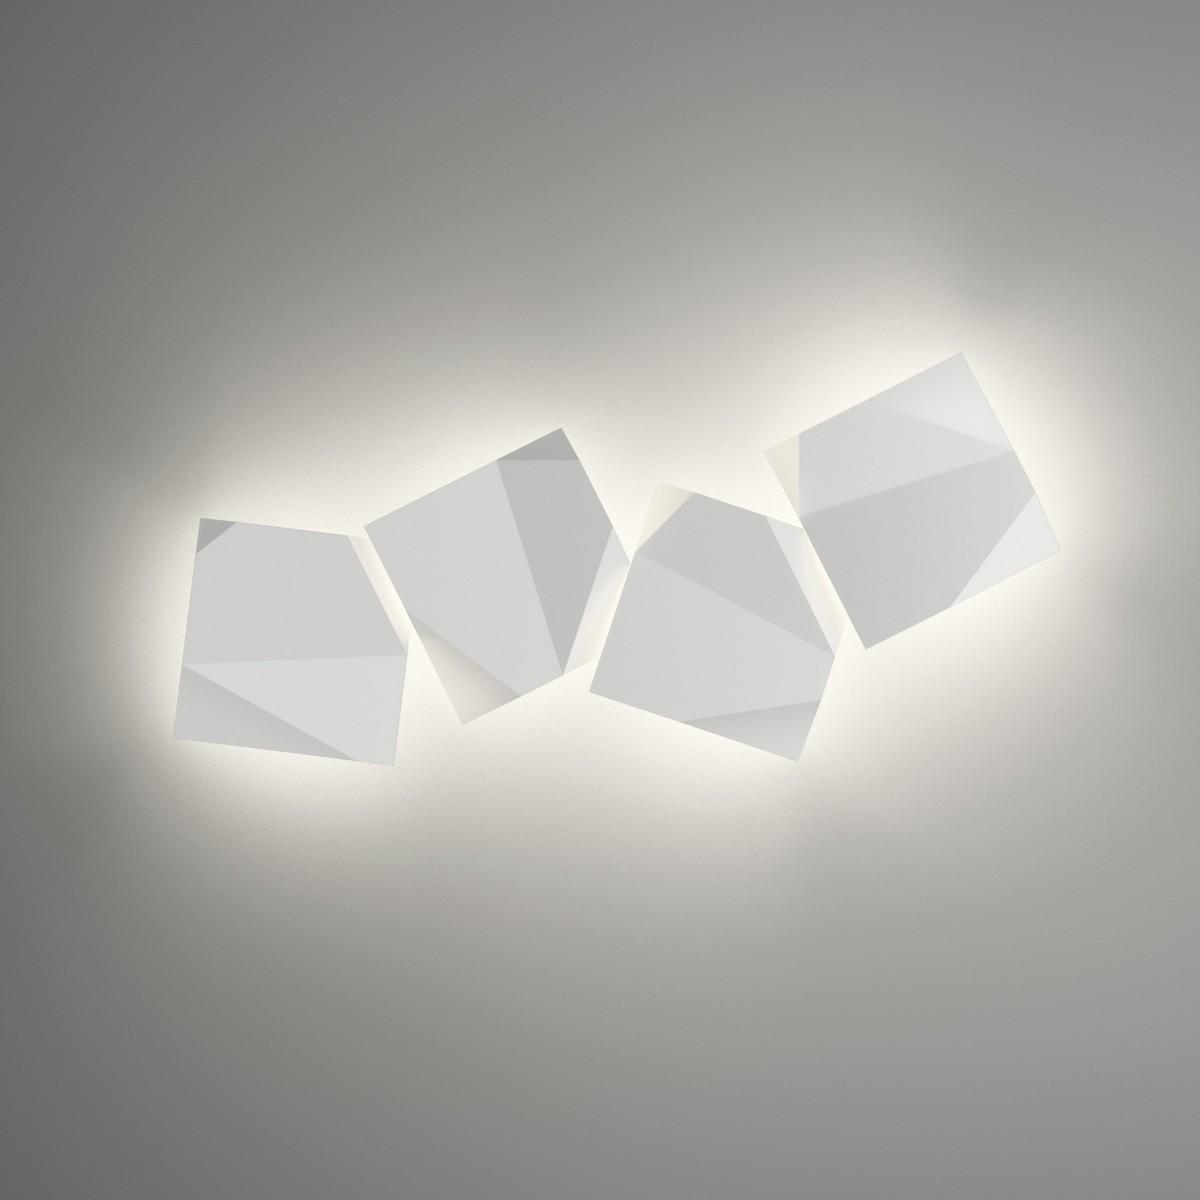 Vibia Origami 4508 Wandleuchte, 4-flg., weiß matt